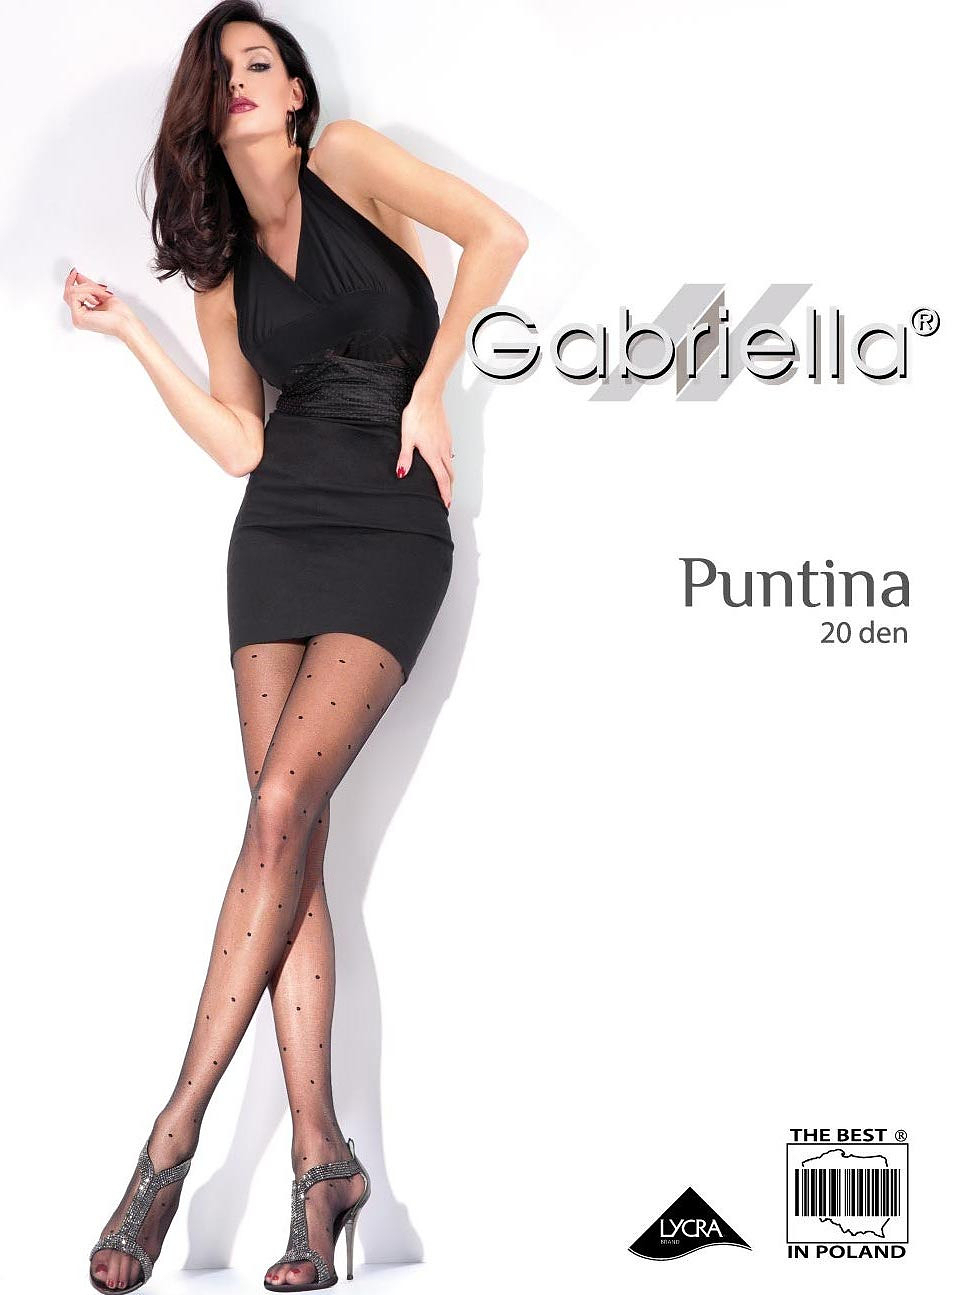 Rajstopy Gabriella 471 Puntina 5-XL (1)